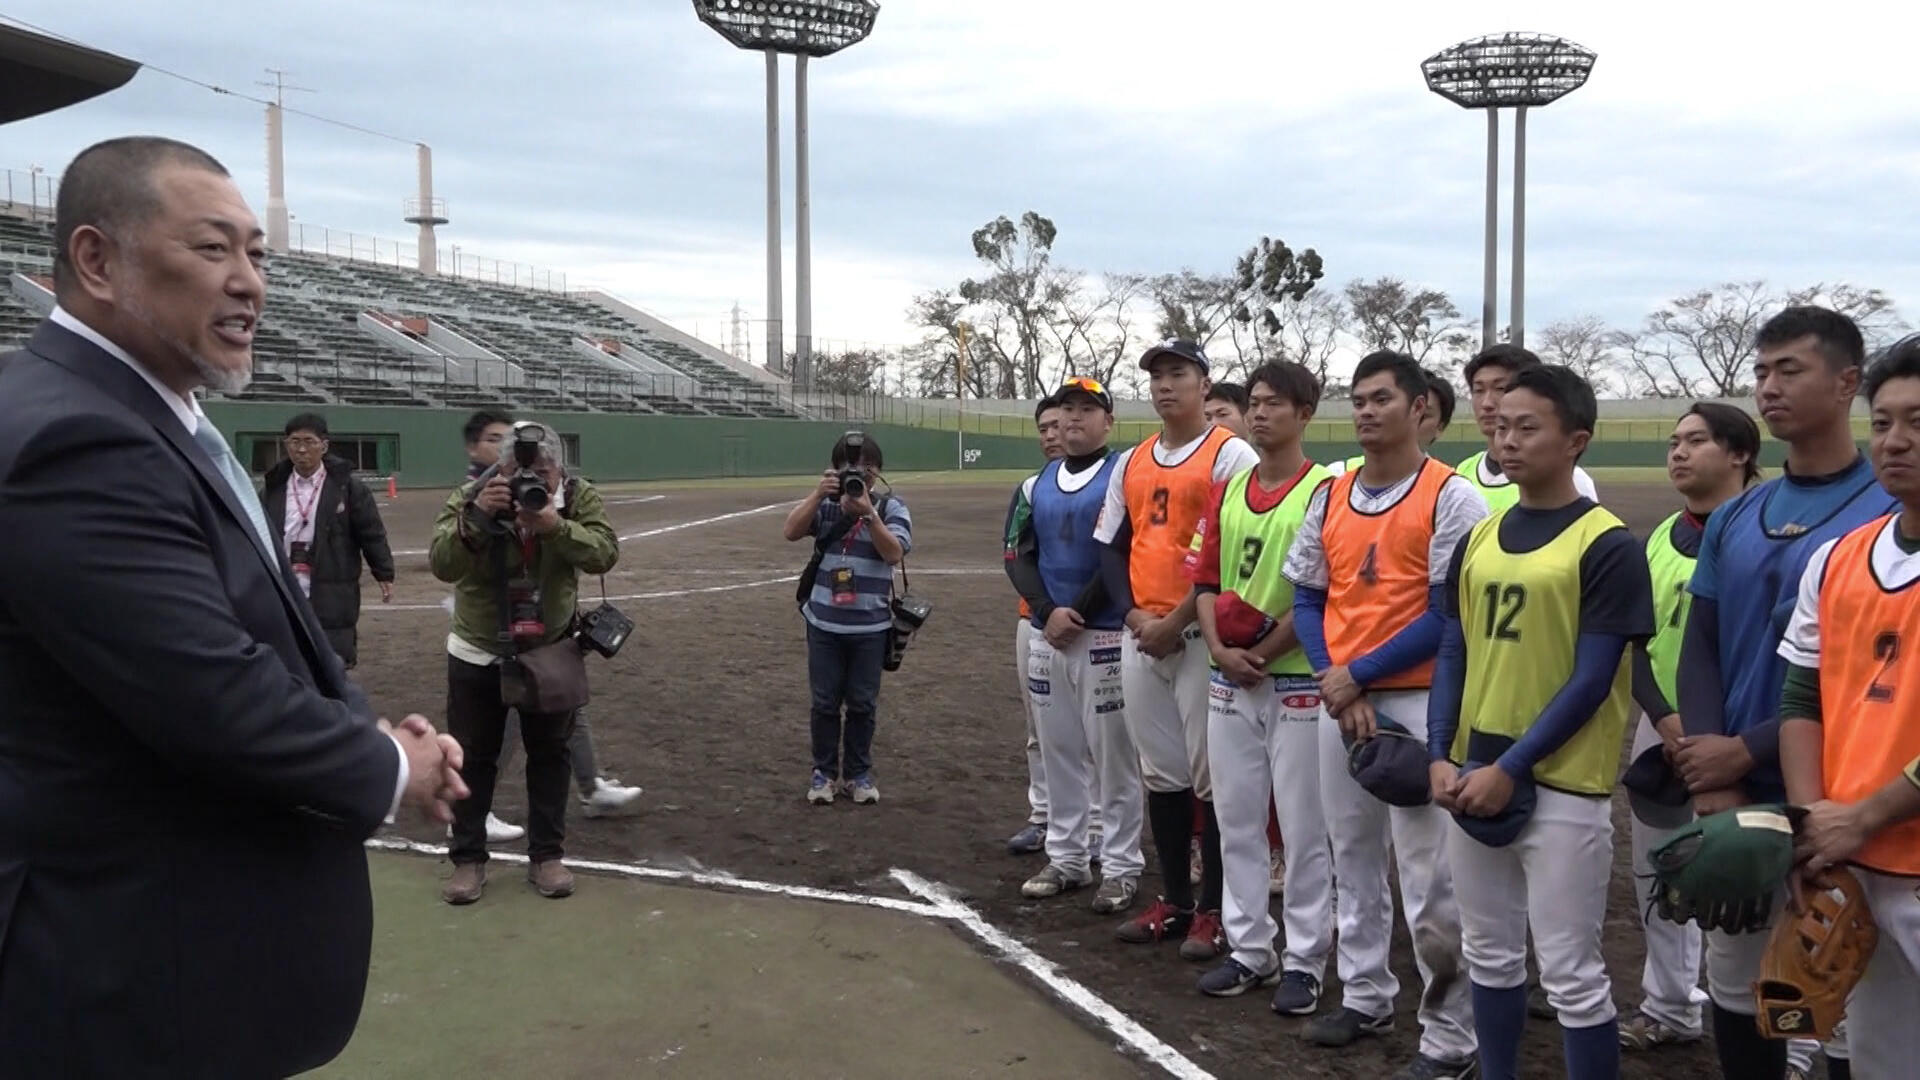 『WorldTryout2019』清原和博監督「野球を楽しむ選手たちが羨ましく感じた」